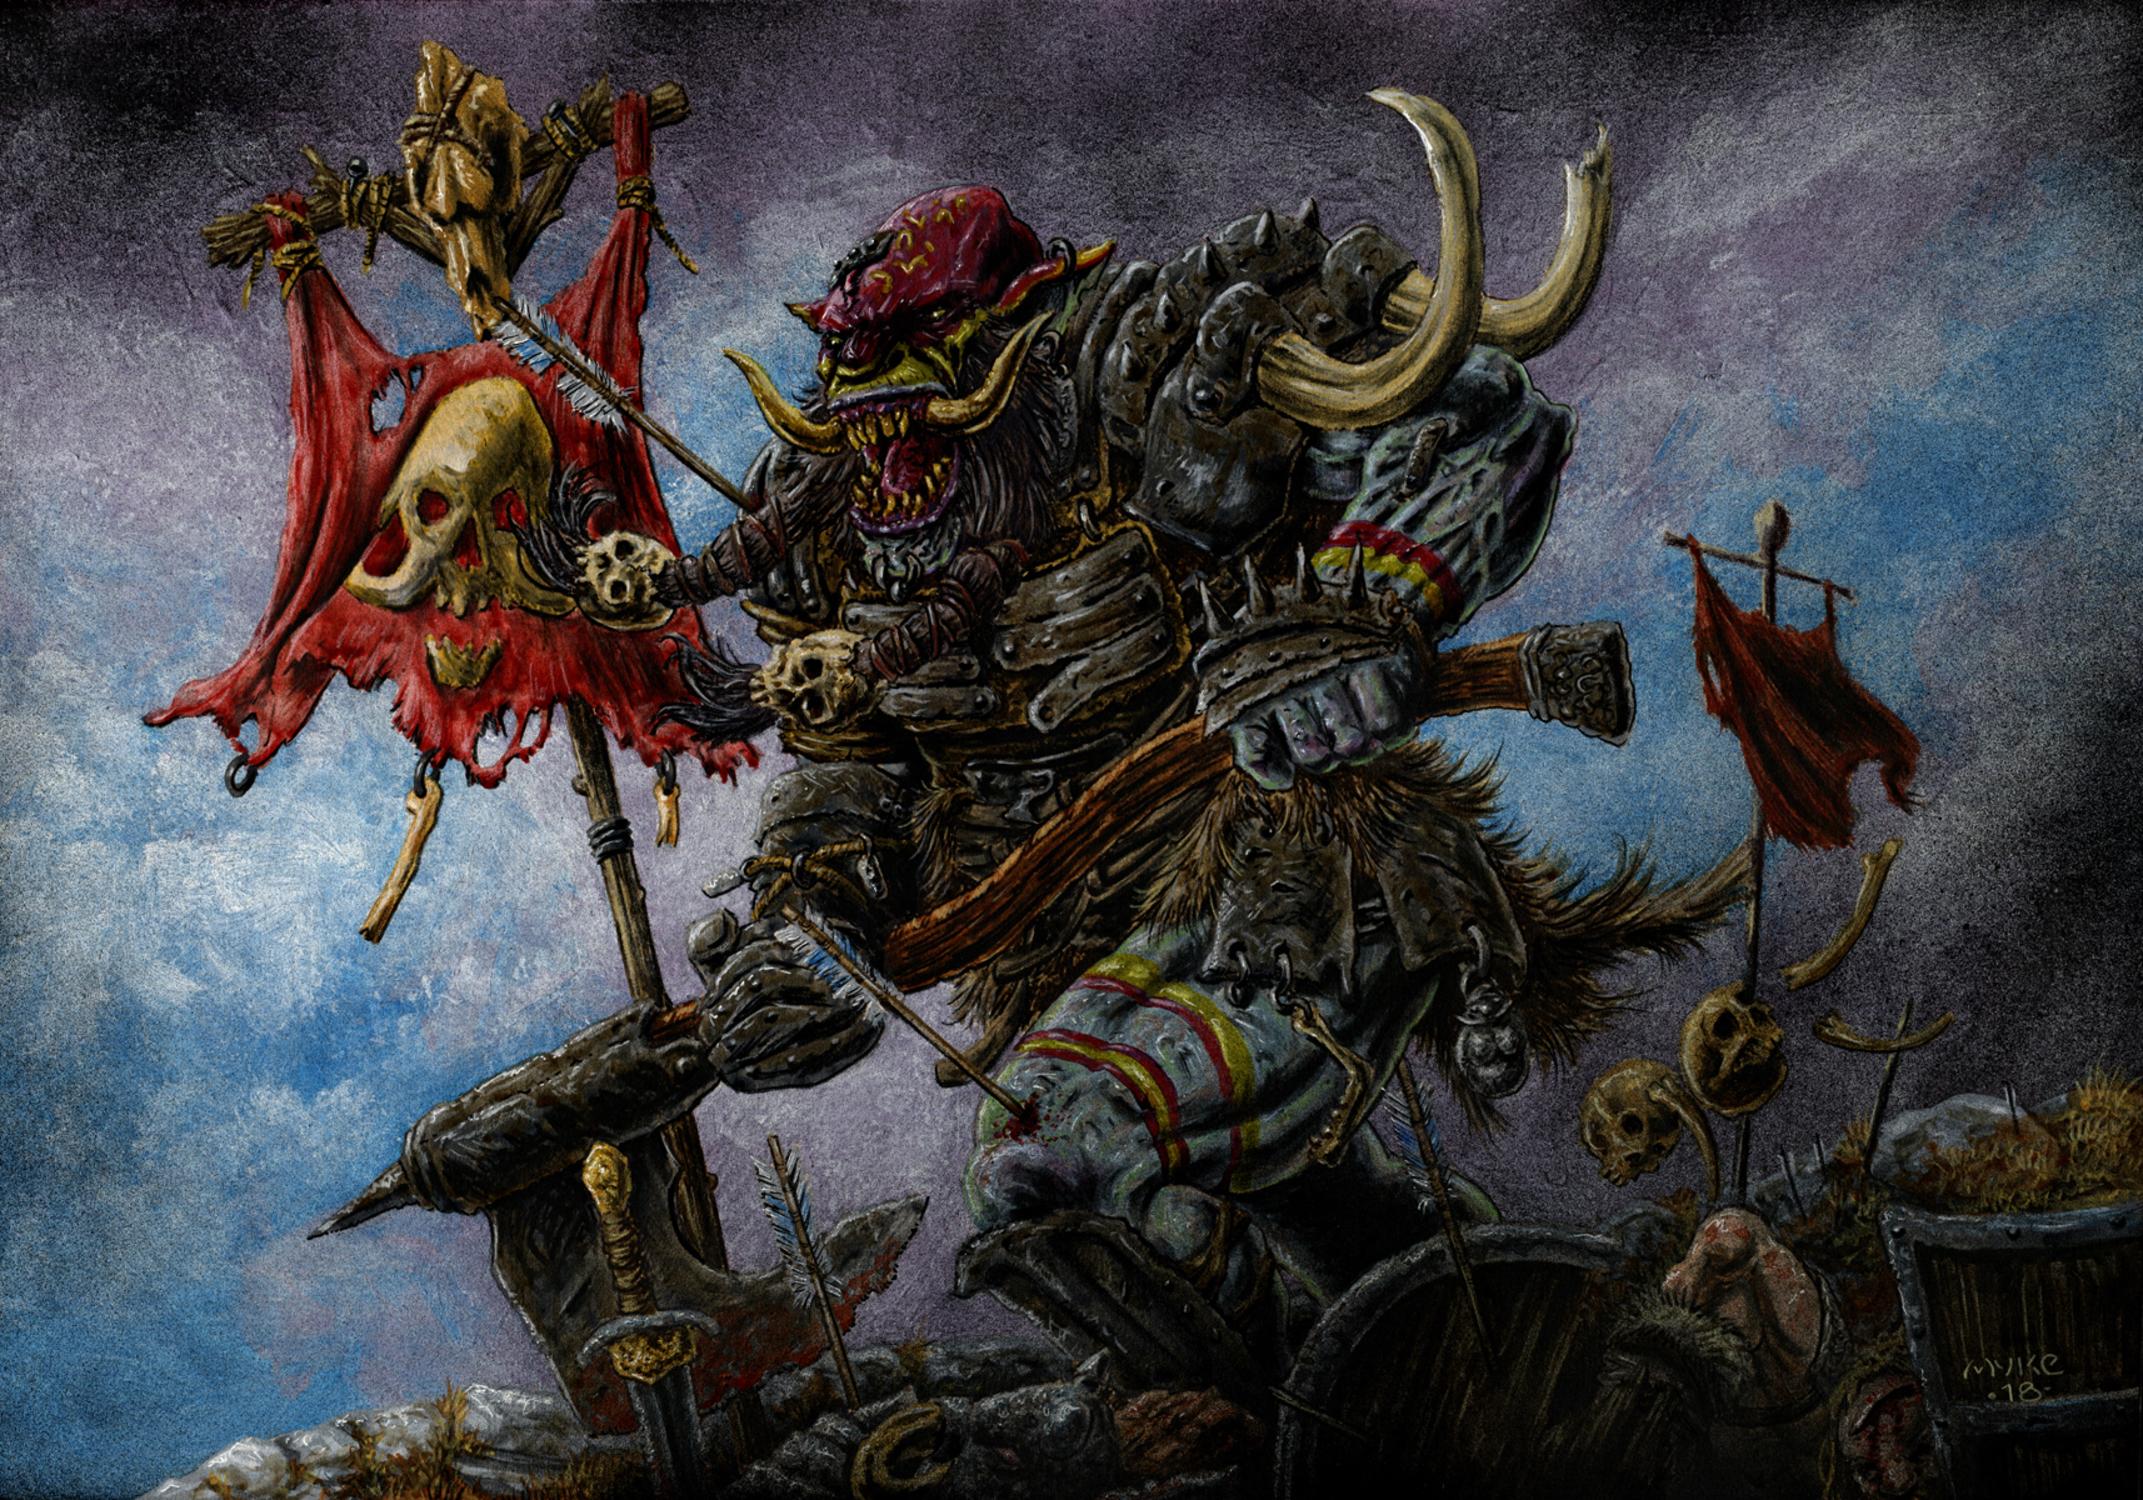 BT Troll Soldier Artwork by Michael Rechlin